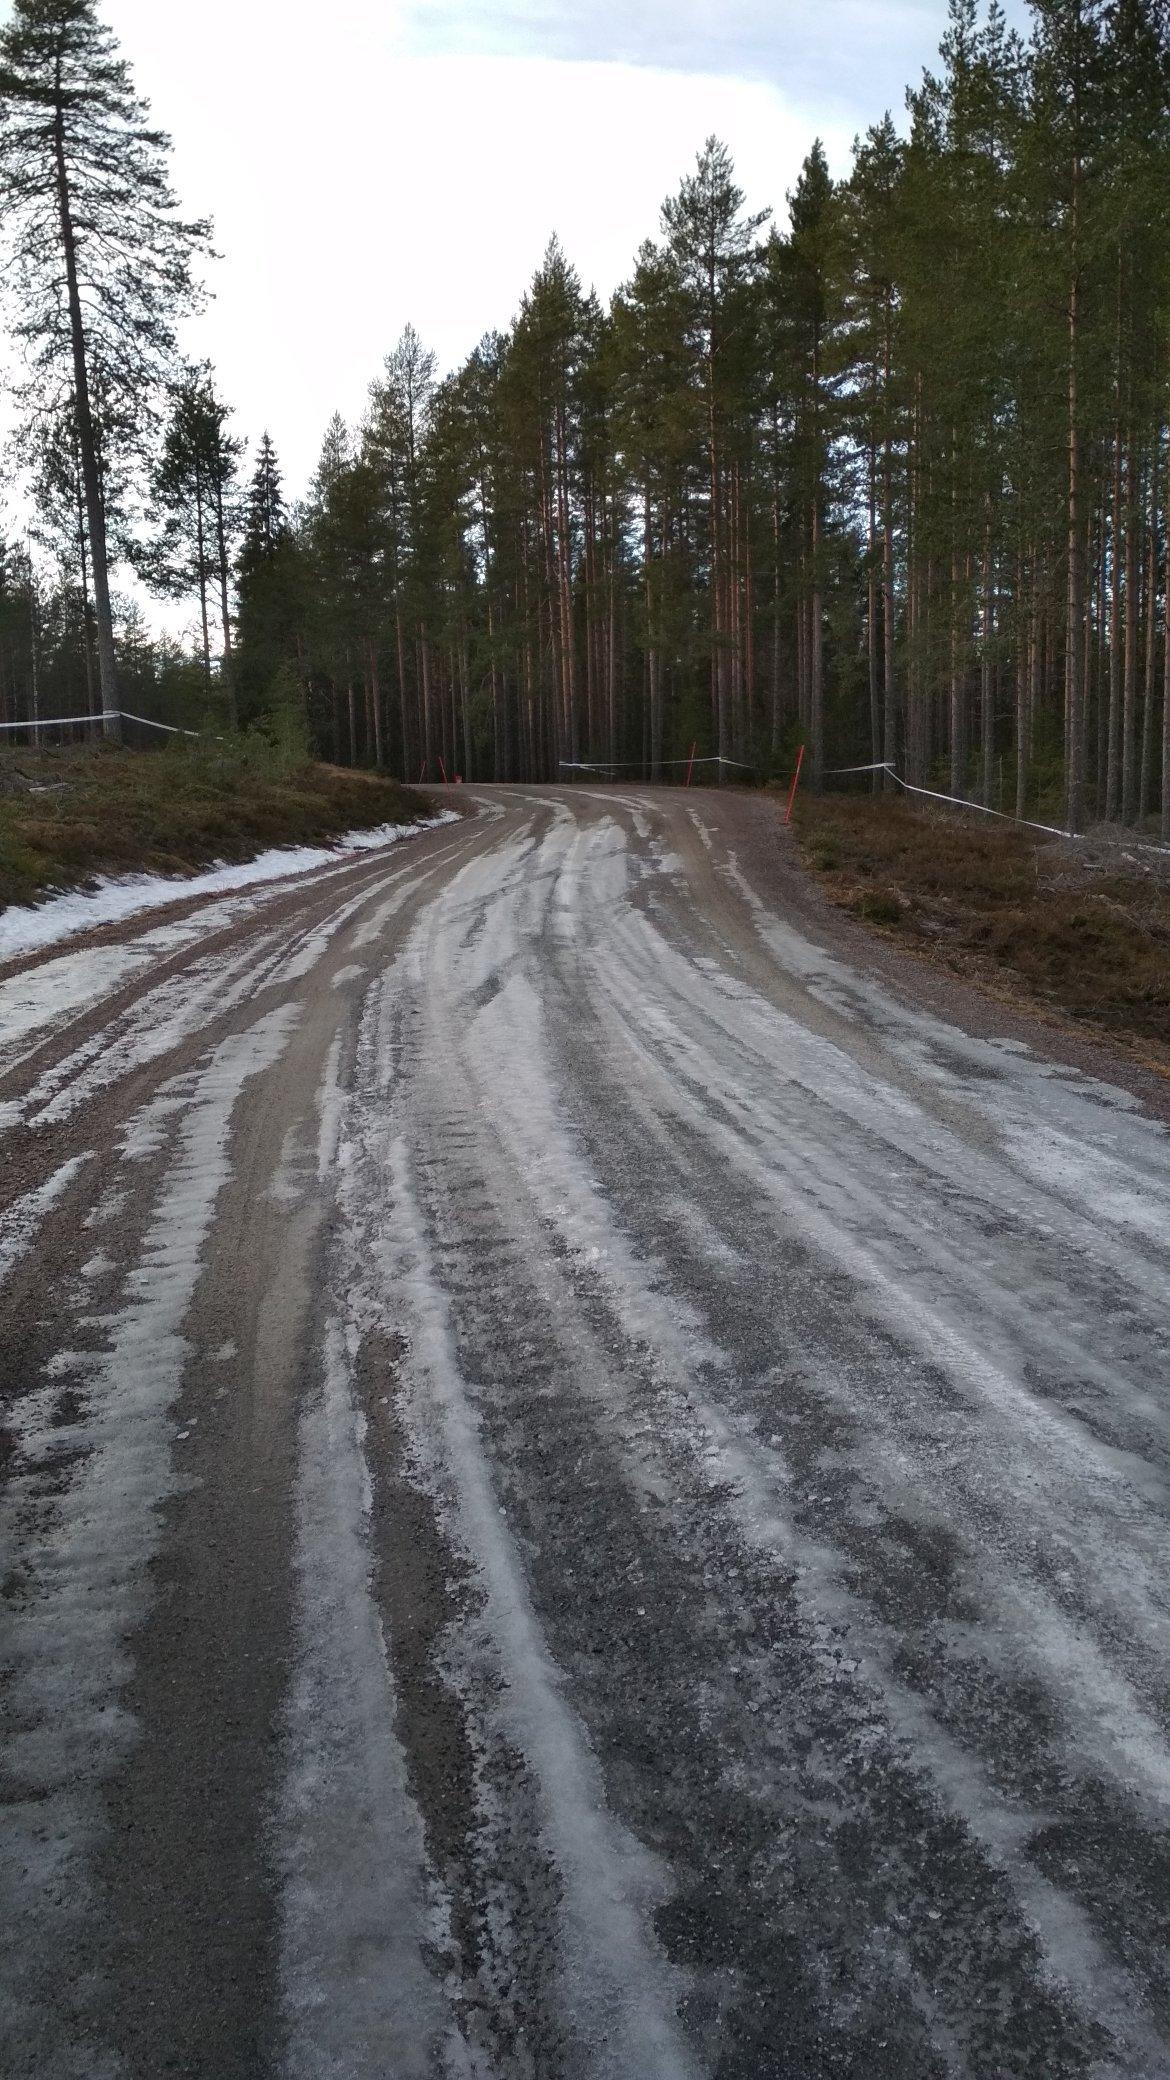 WRC: 68º Rallye Sweden [13-16 Febrero] - Página 2 EQgtgCUW4AAwbPg?format=jpg&name=4096x4096